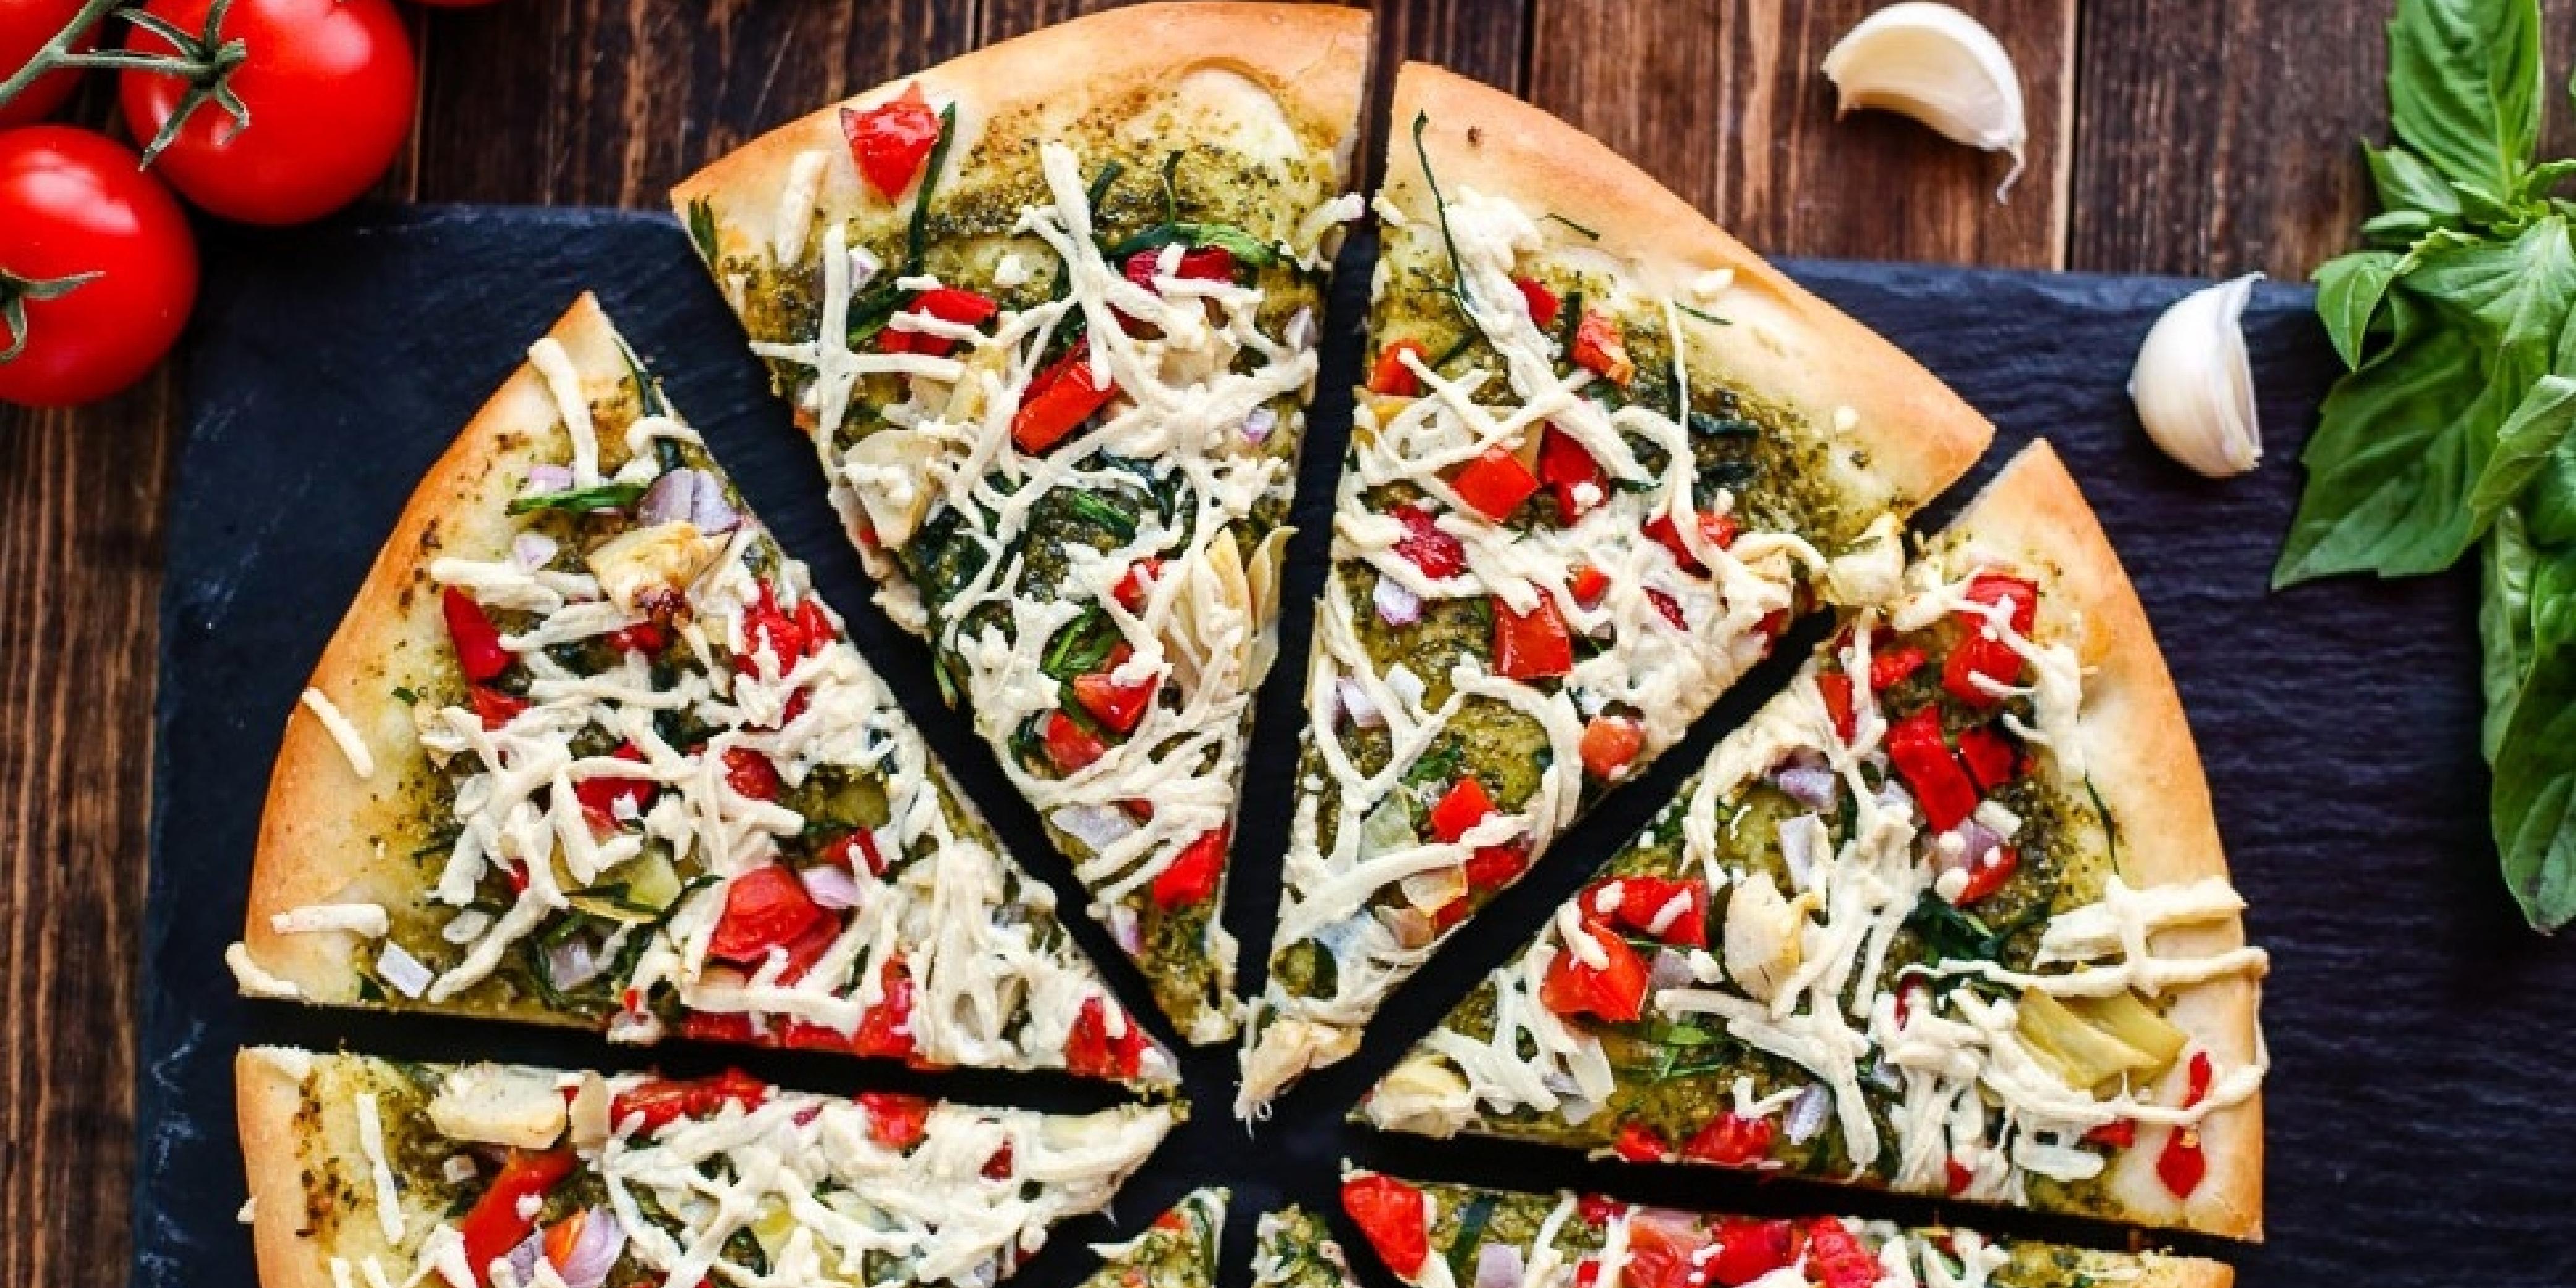 5 Pizzerías Veganas o Gluten Free en San Juan